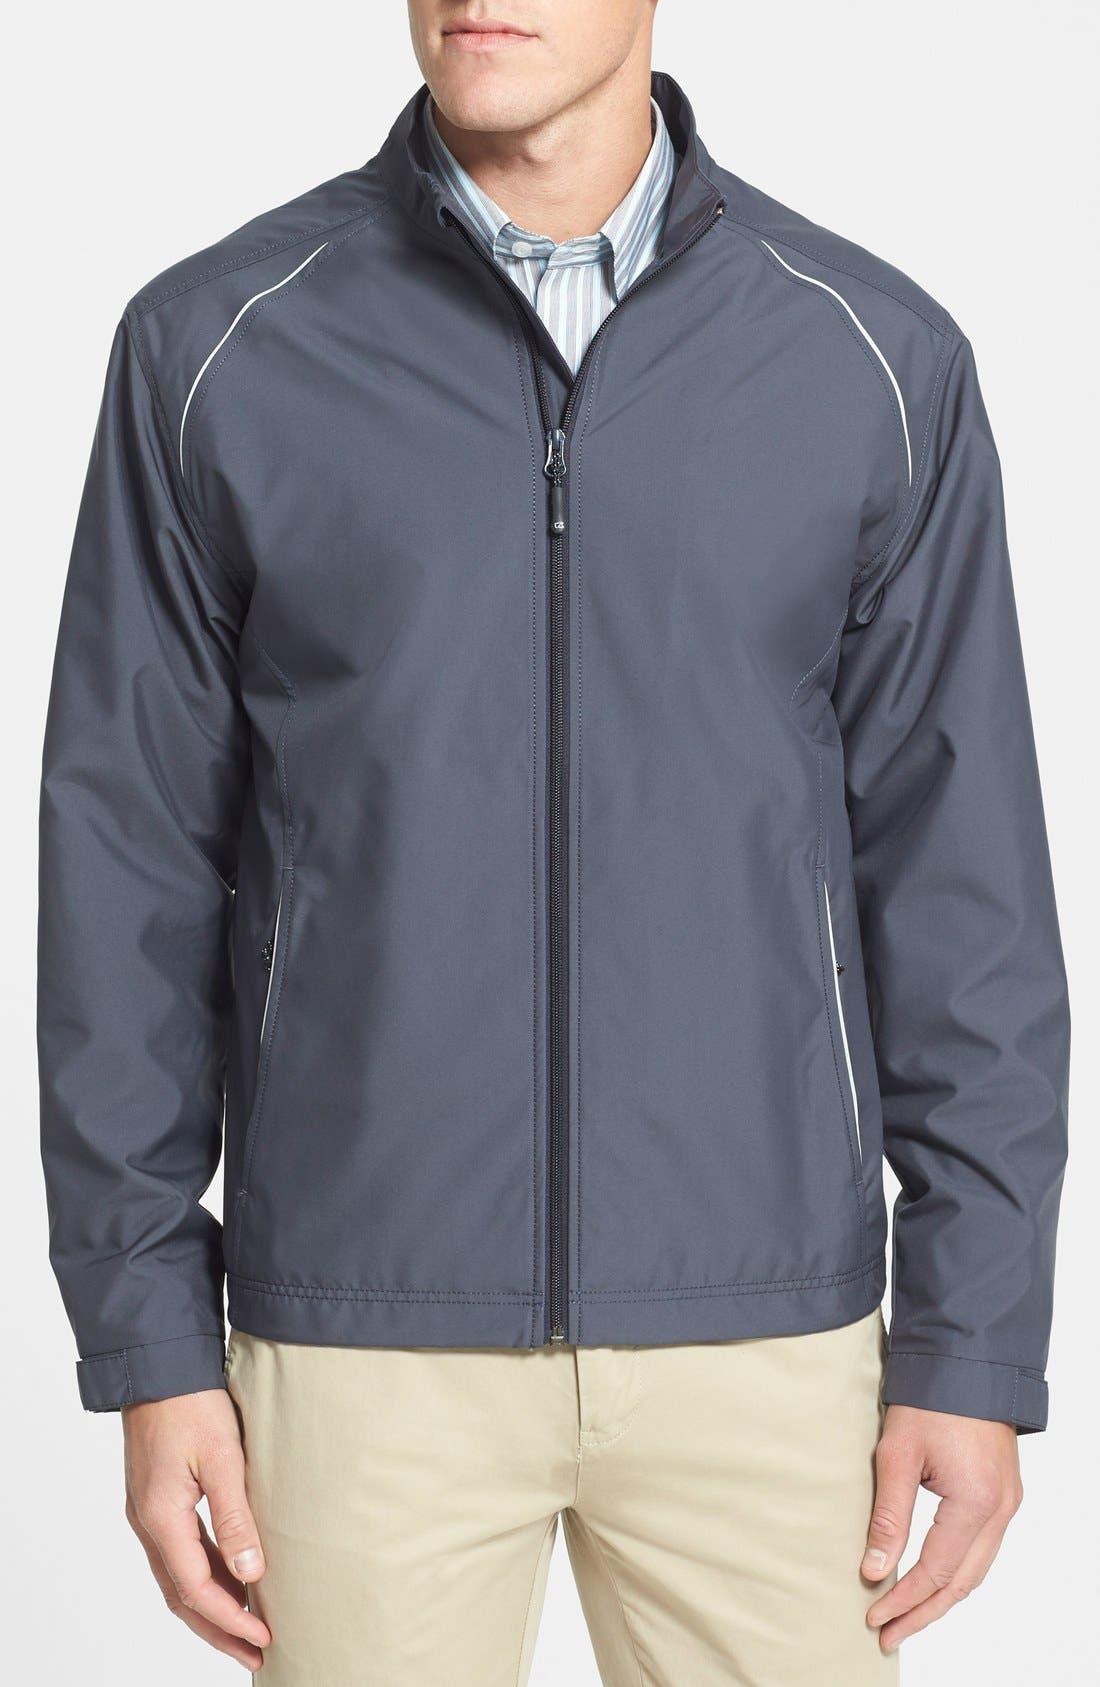 CUTTER & BUCK Beacon WeatherTec Wind & Water Resistant Jacket, Main, color, ONYX GREY